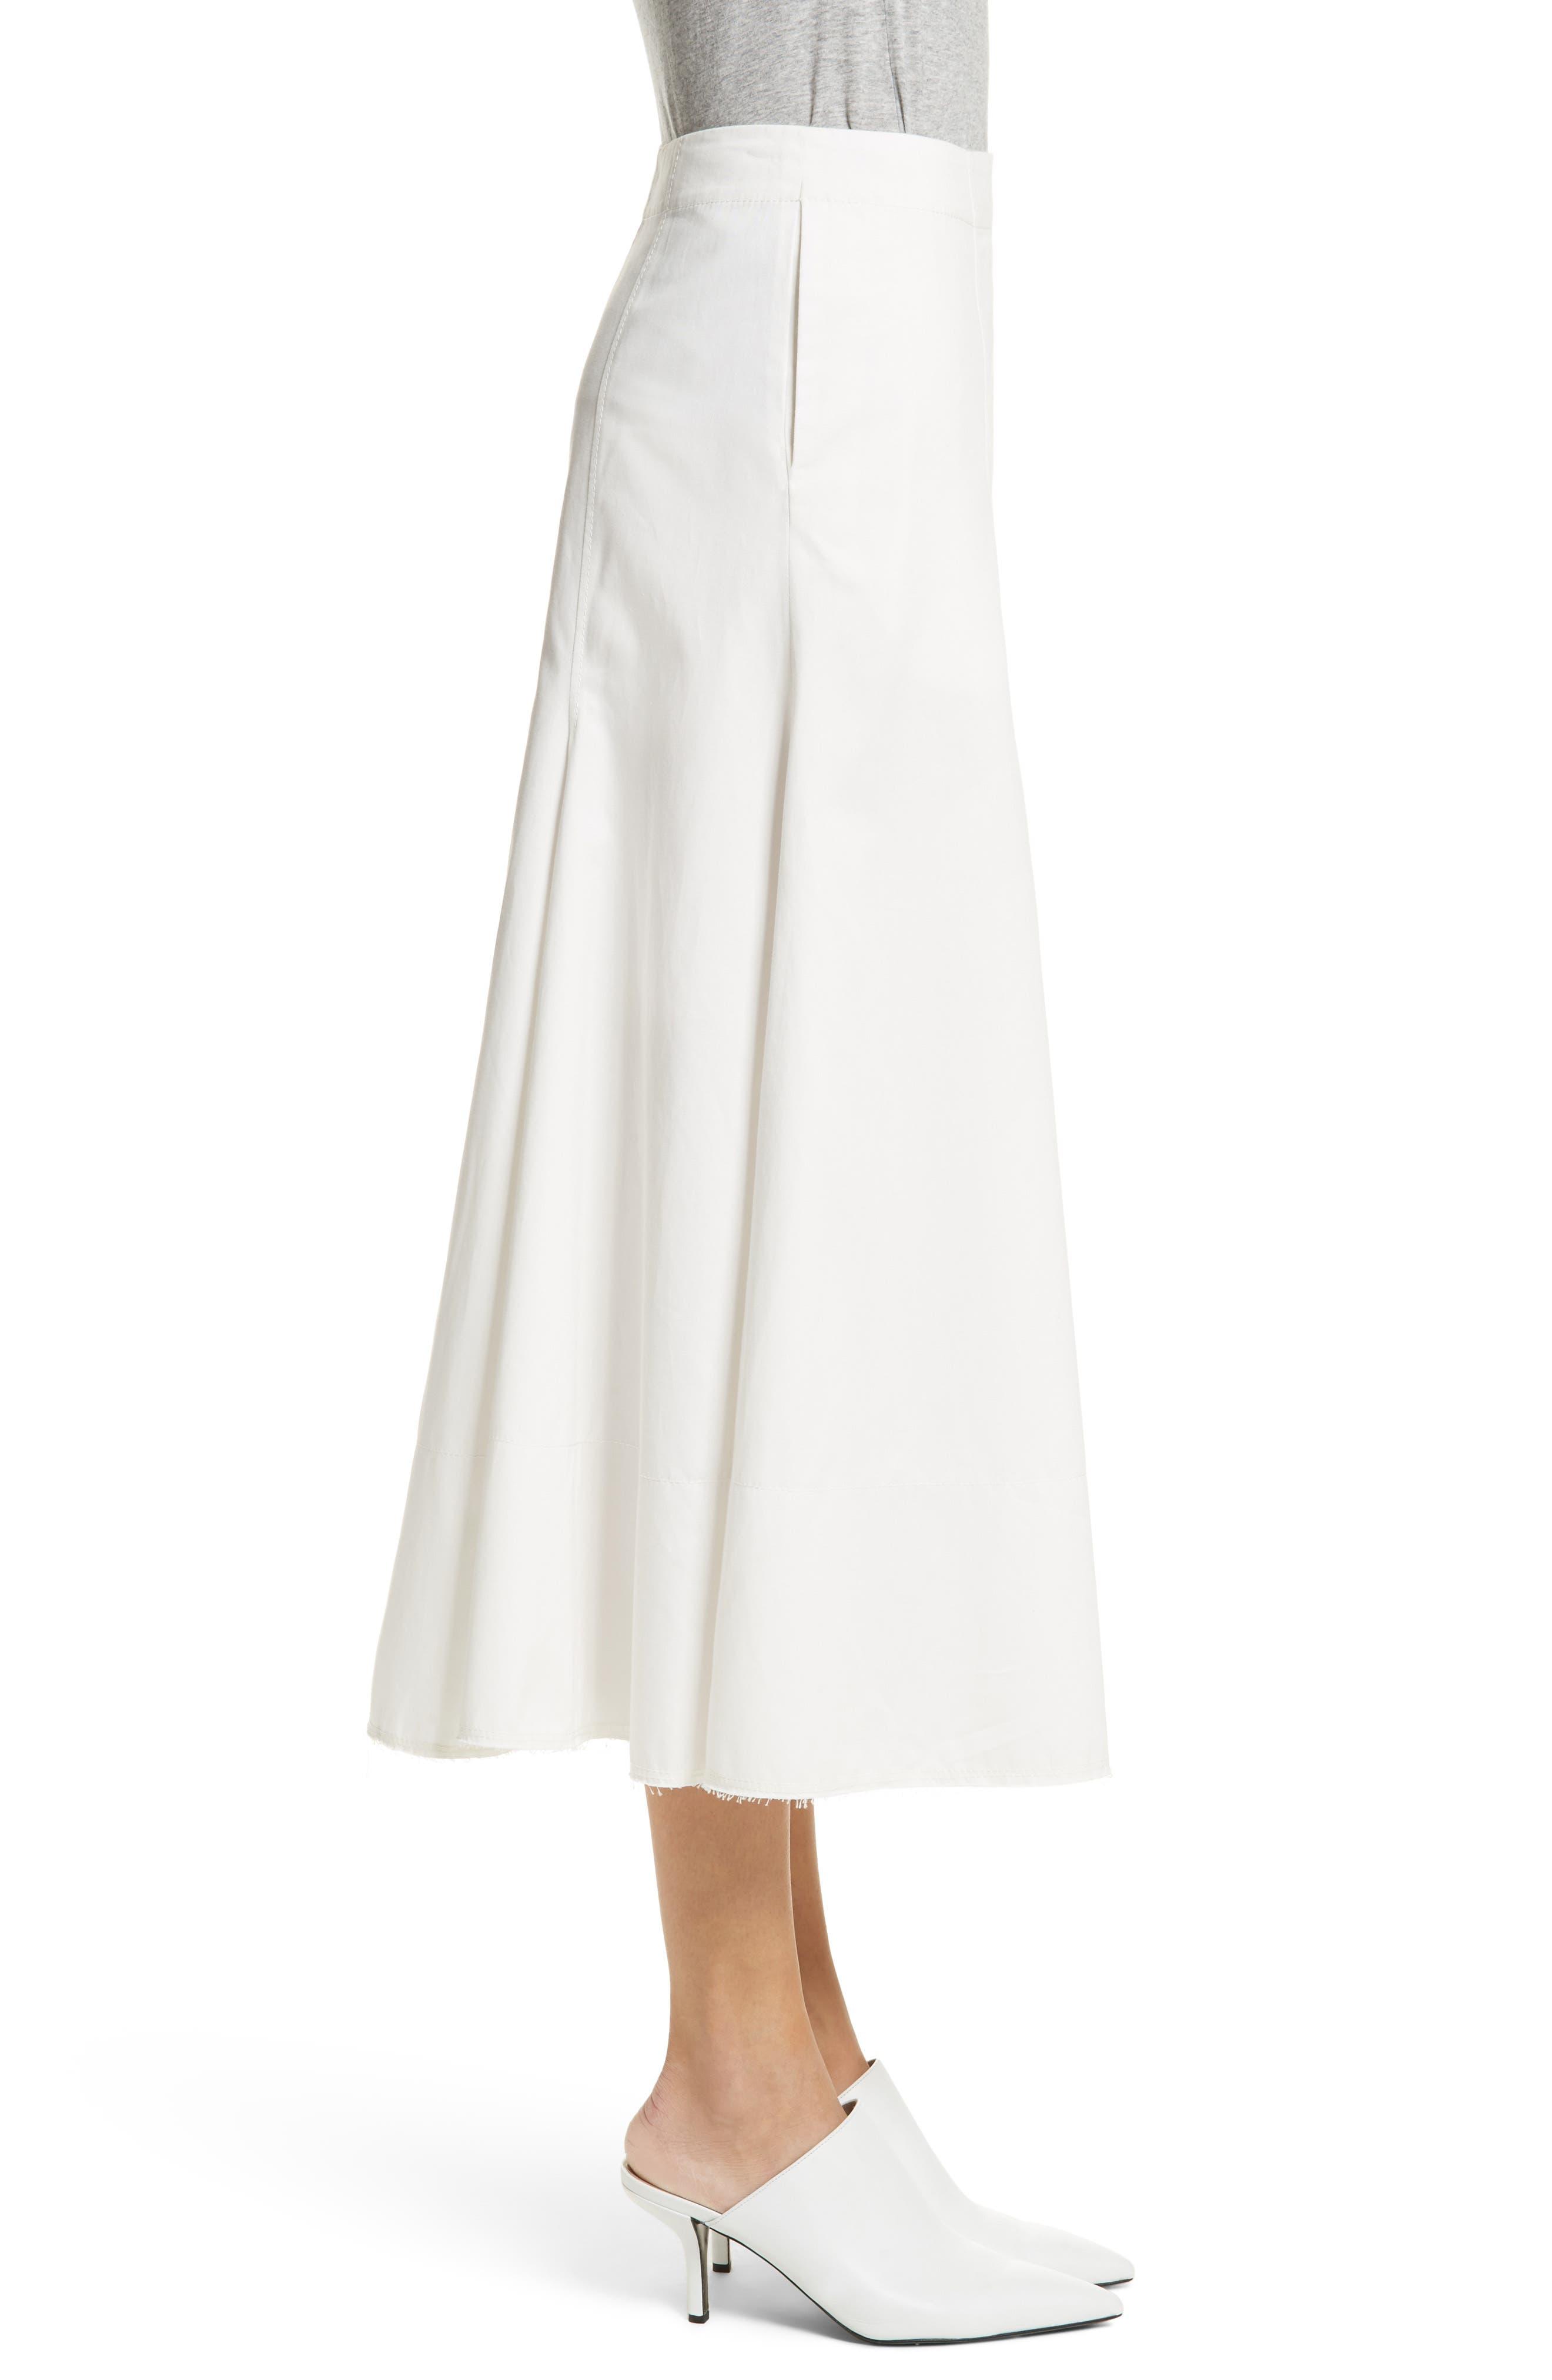 Twill Chino Midi Skirt,                             Alternate thumbnail 3, color,                             Ecru